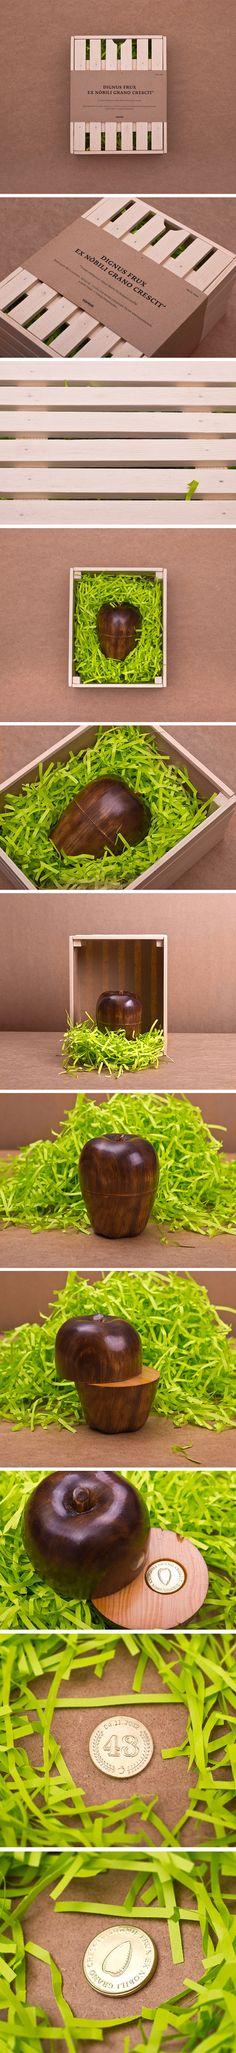 Отборное зерно Хэндмейд © province. another very interesting #packaging #design PD: